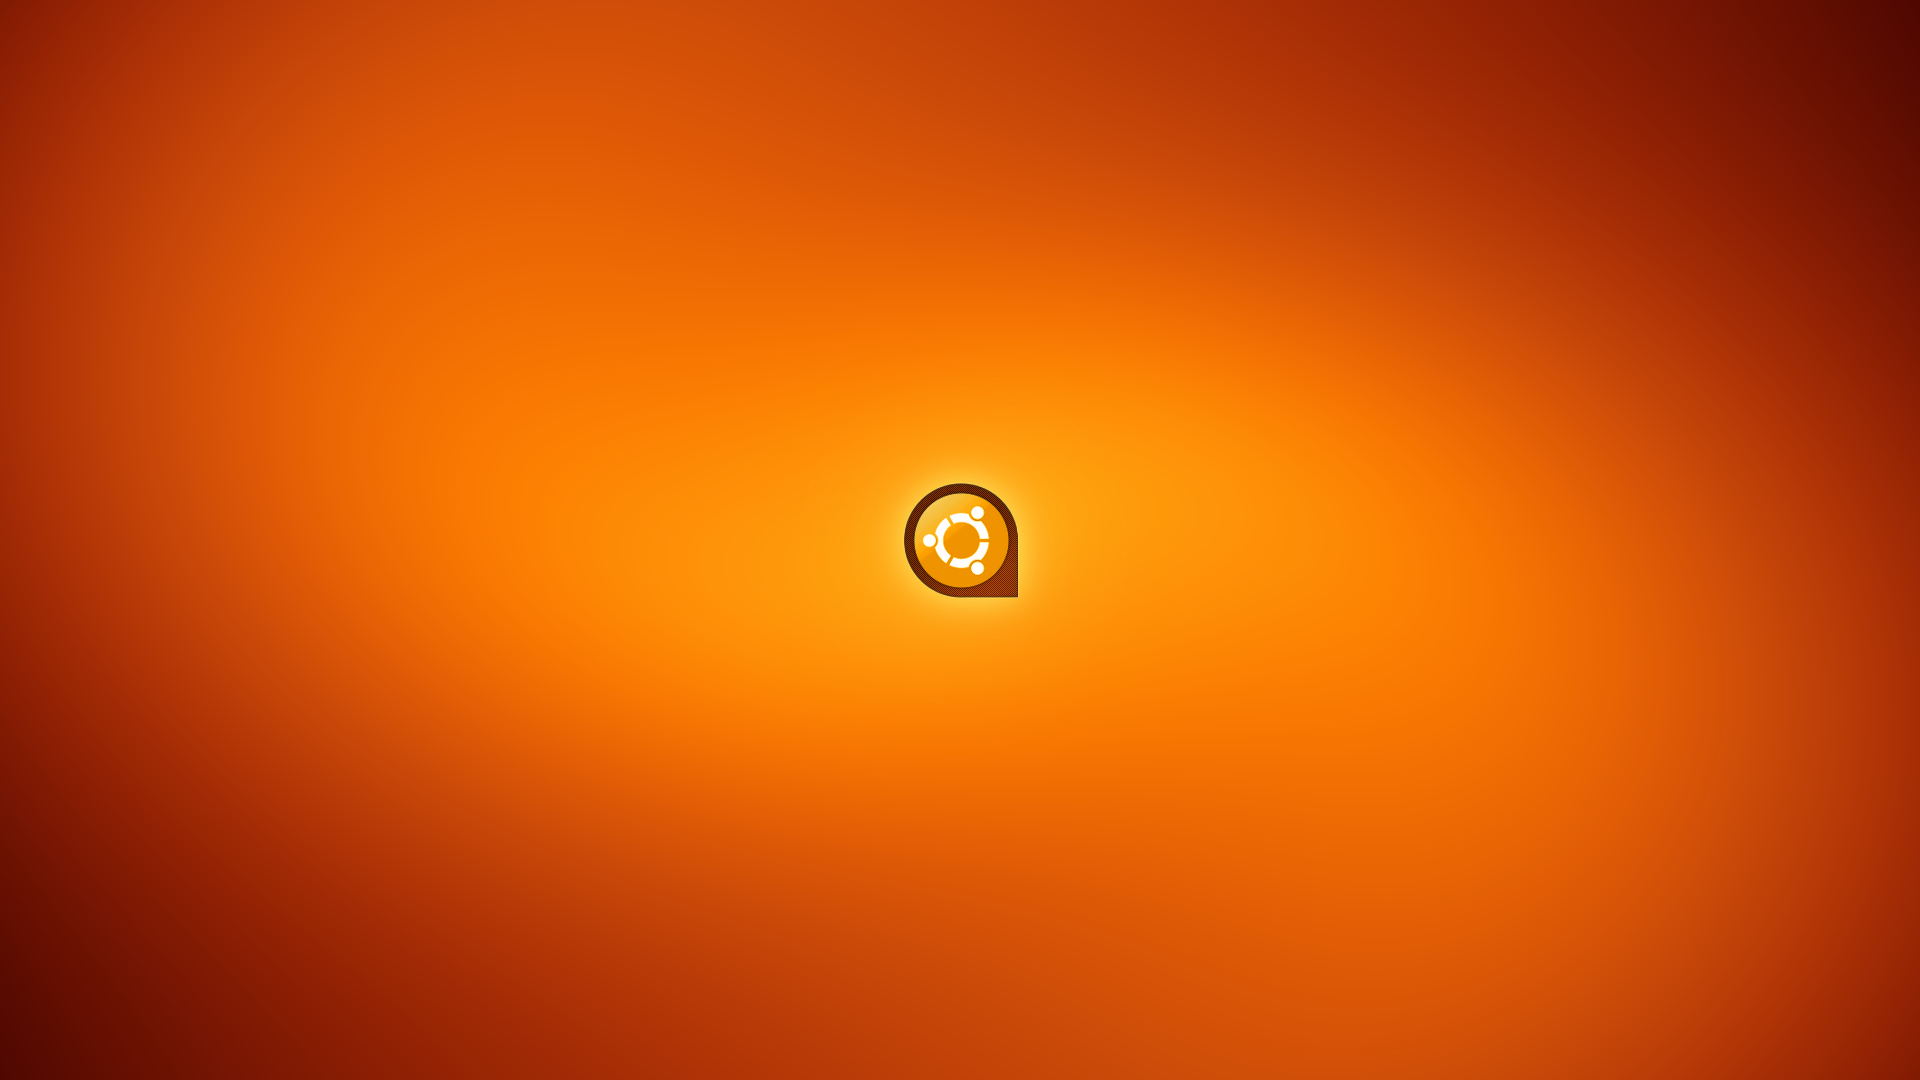 Ubuntu Logo - HD Wallpapers